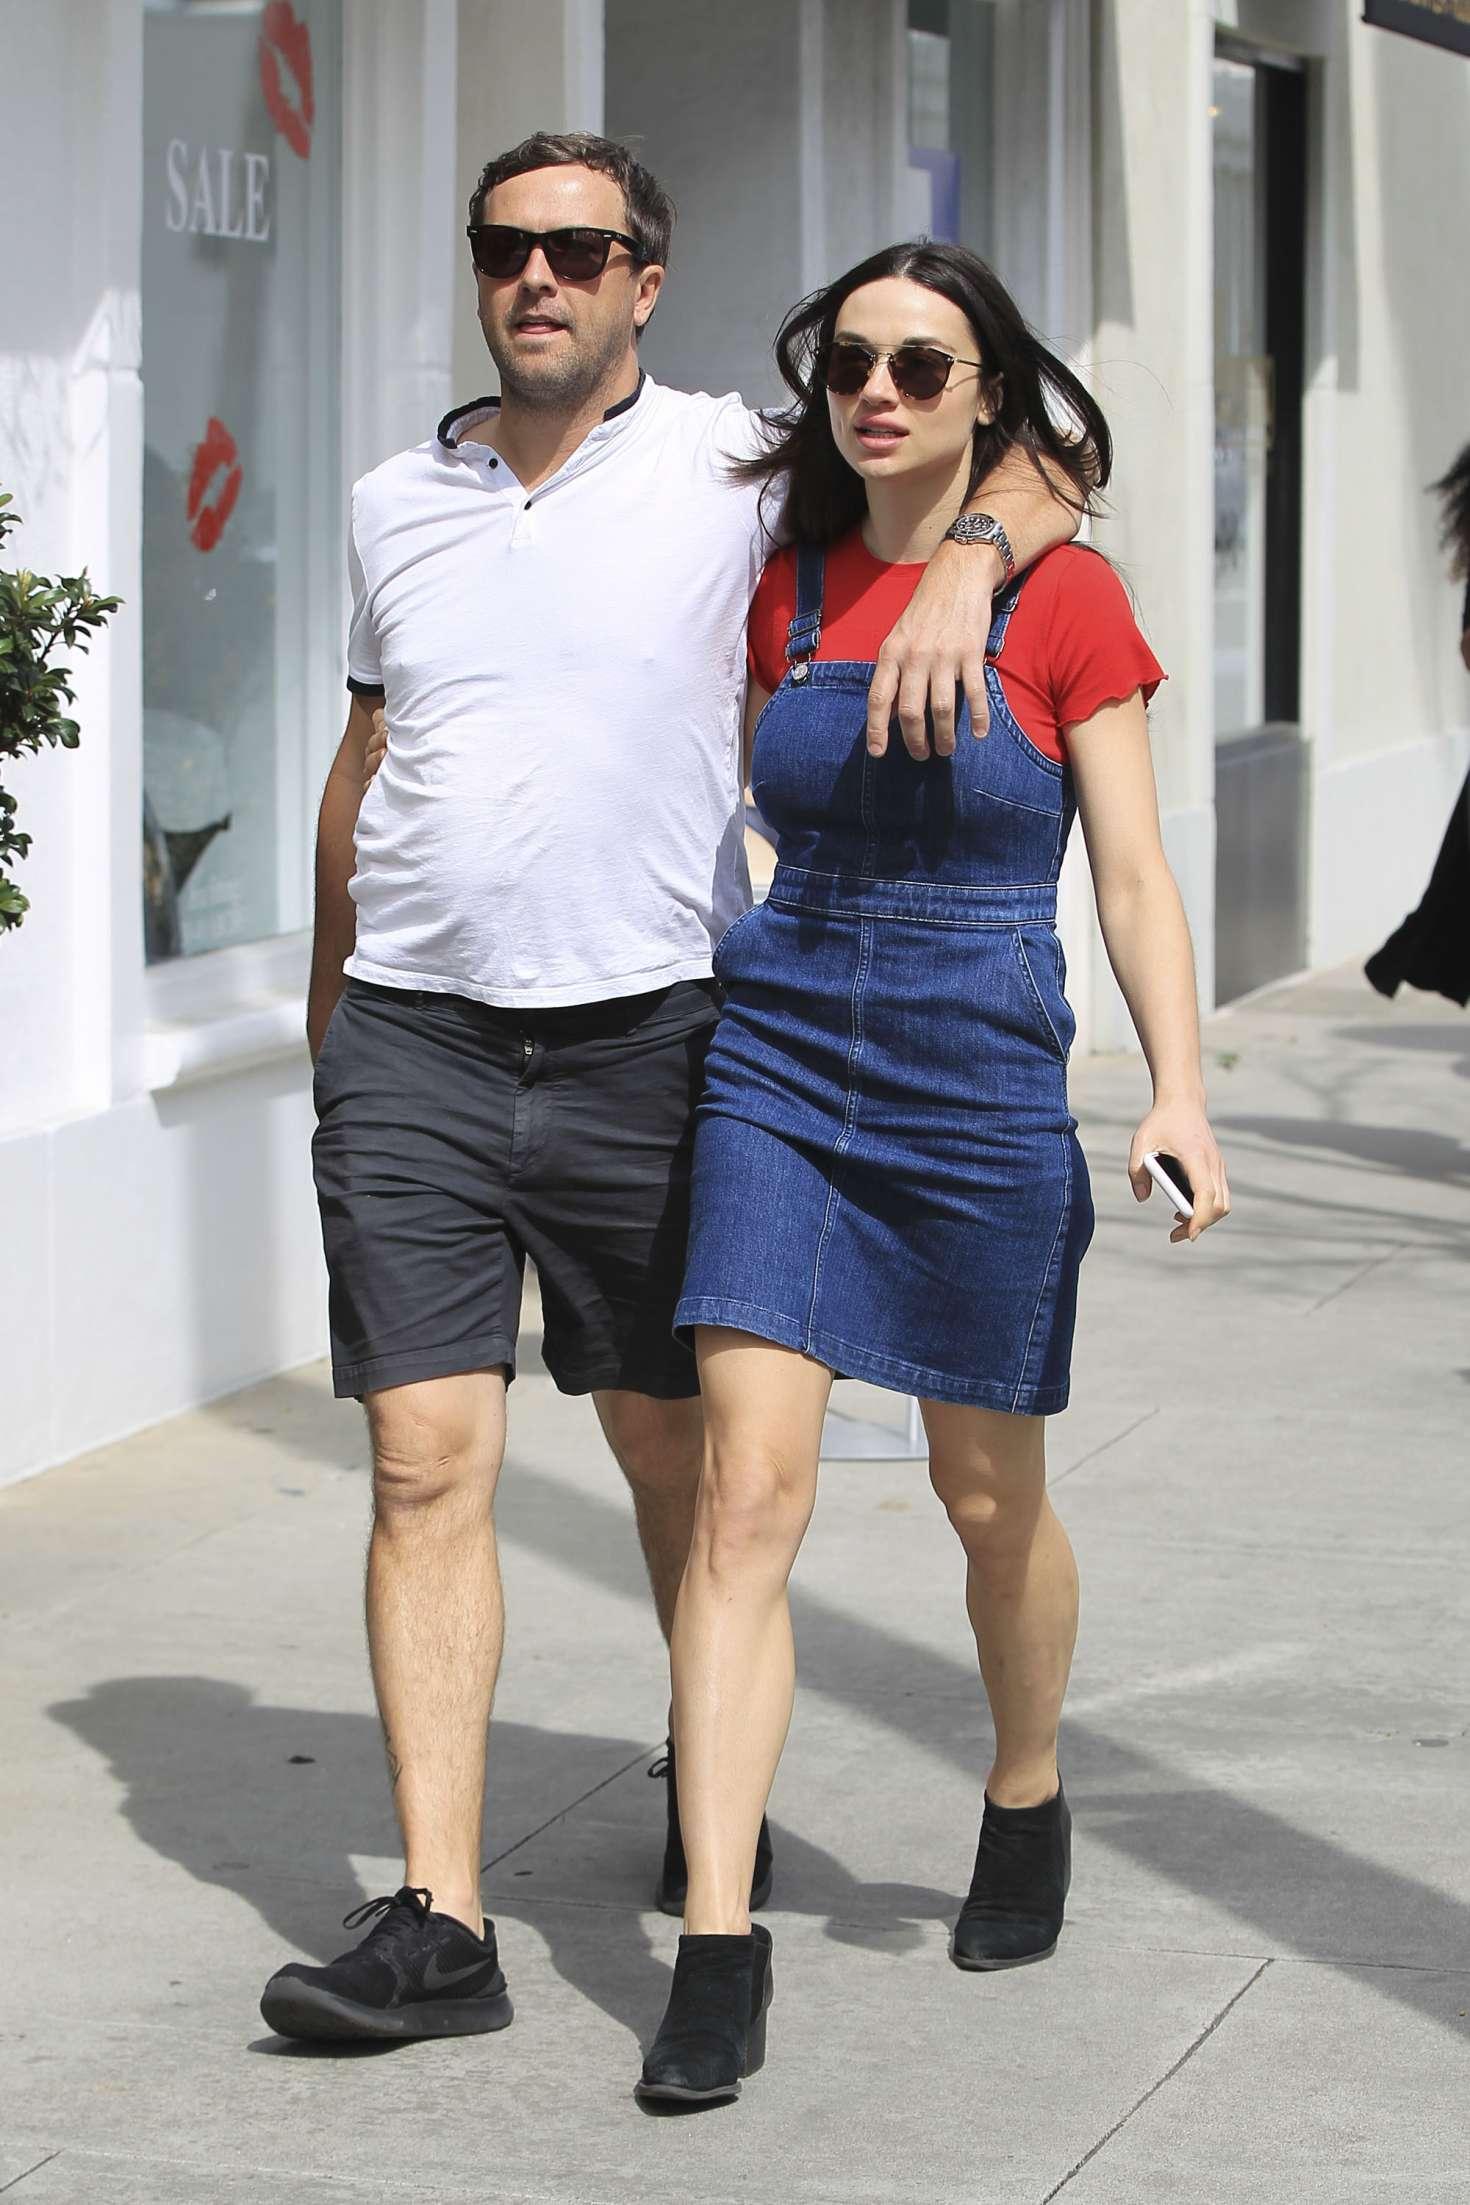 Bethany Joy Lenz Boyfriend Classy crystal reed with boyfriend darren mcmullen shopping in beverly